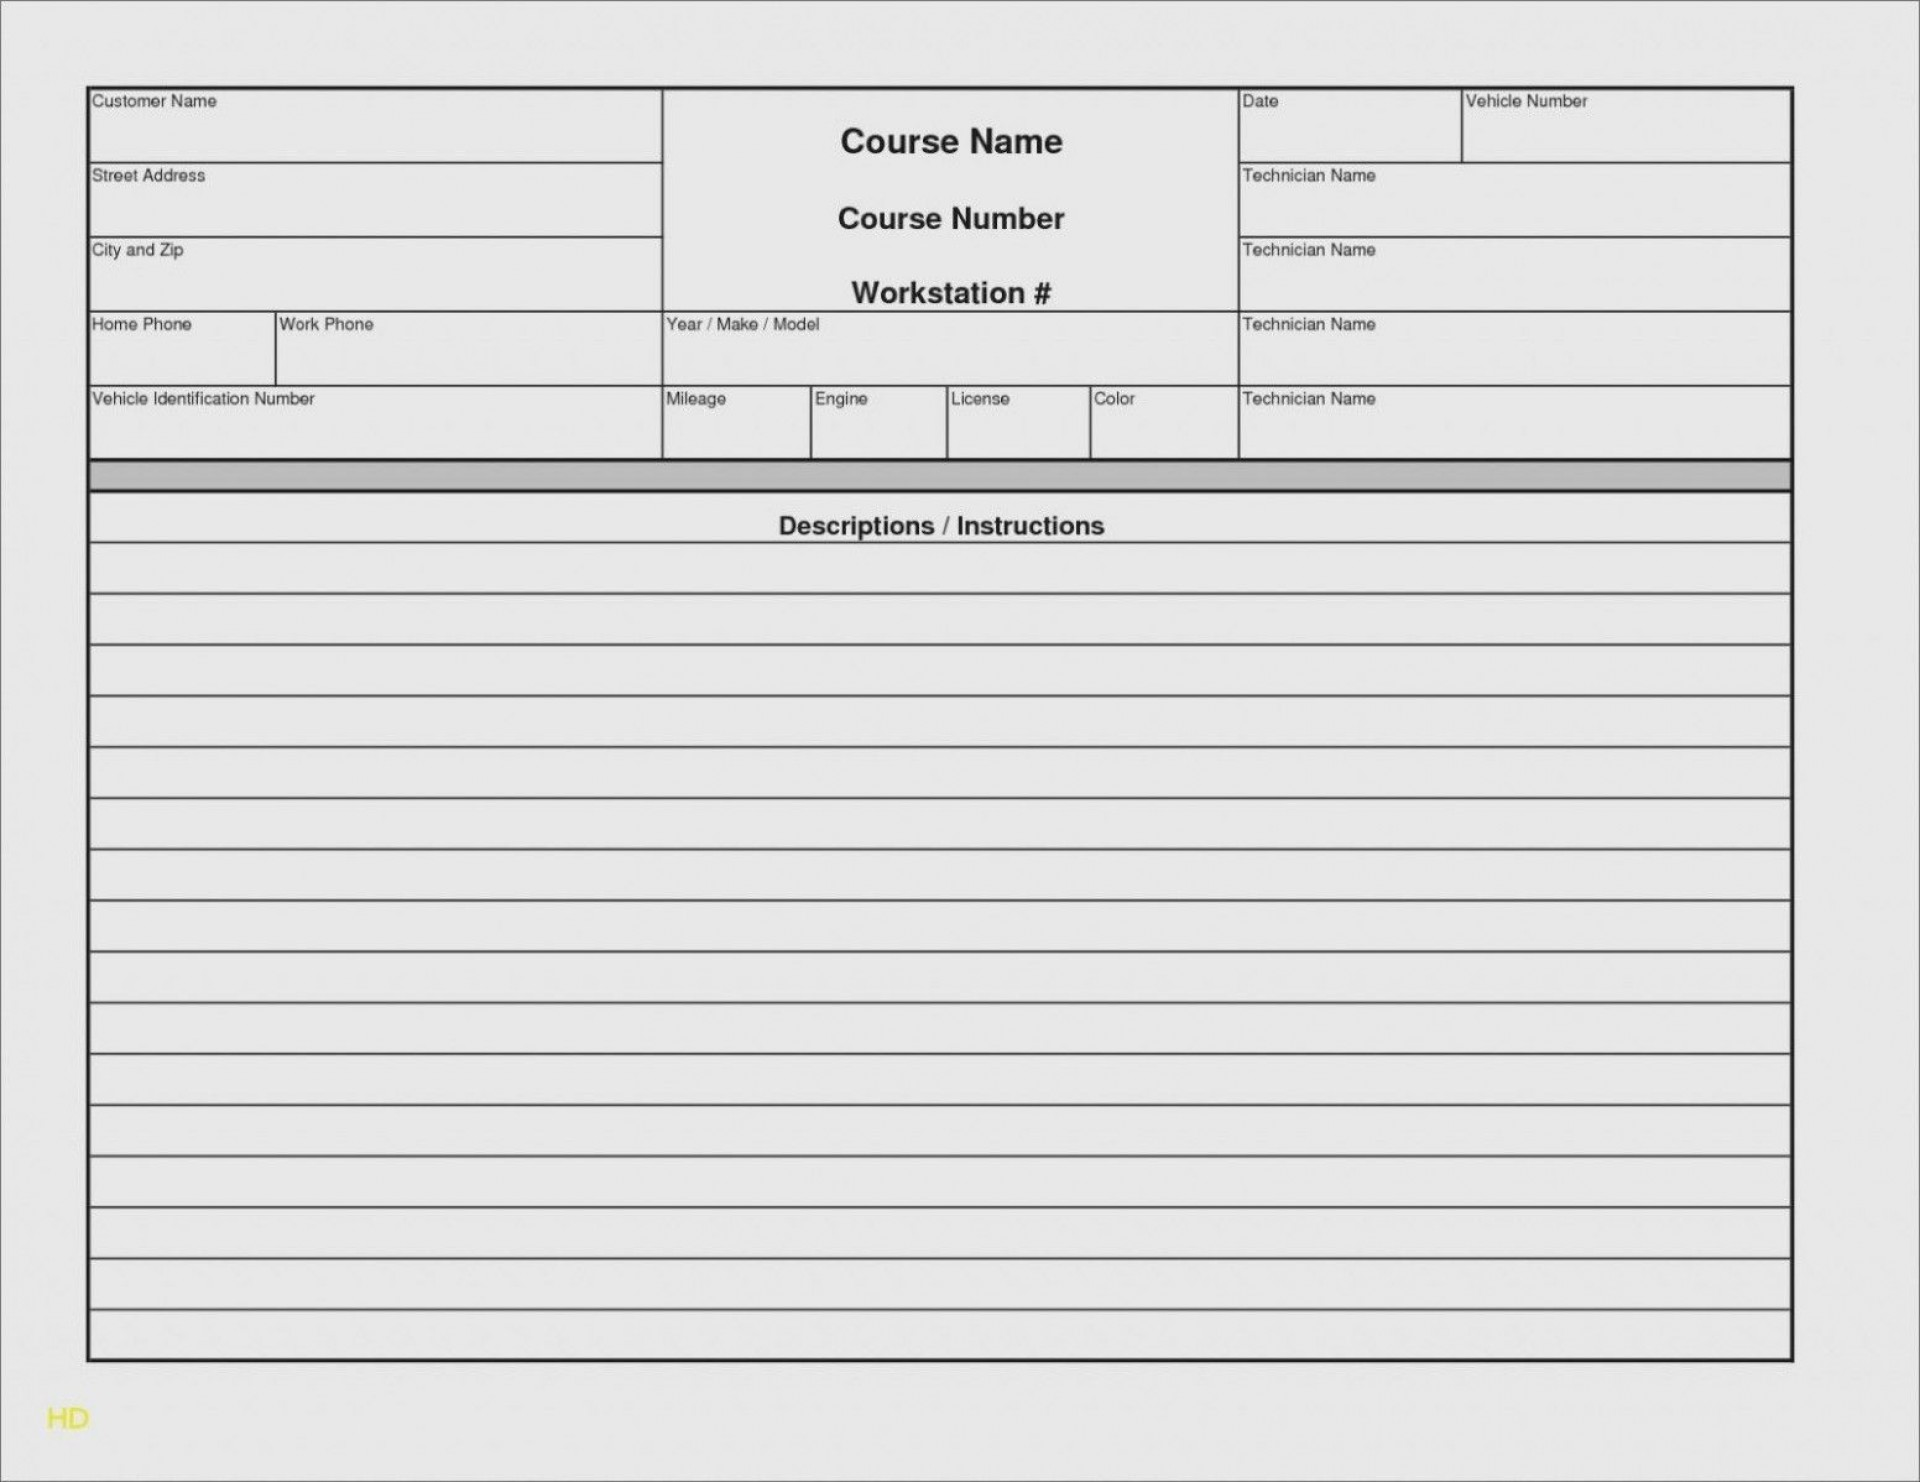 004 Unusual Automotive Repair Invoice Template Free Sample  Auto Excel Pdf1920